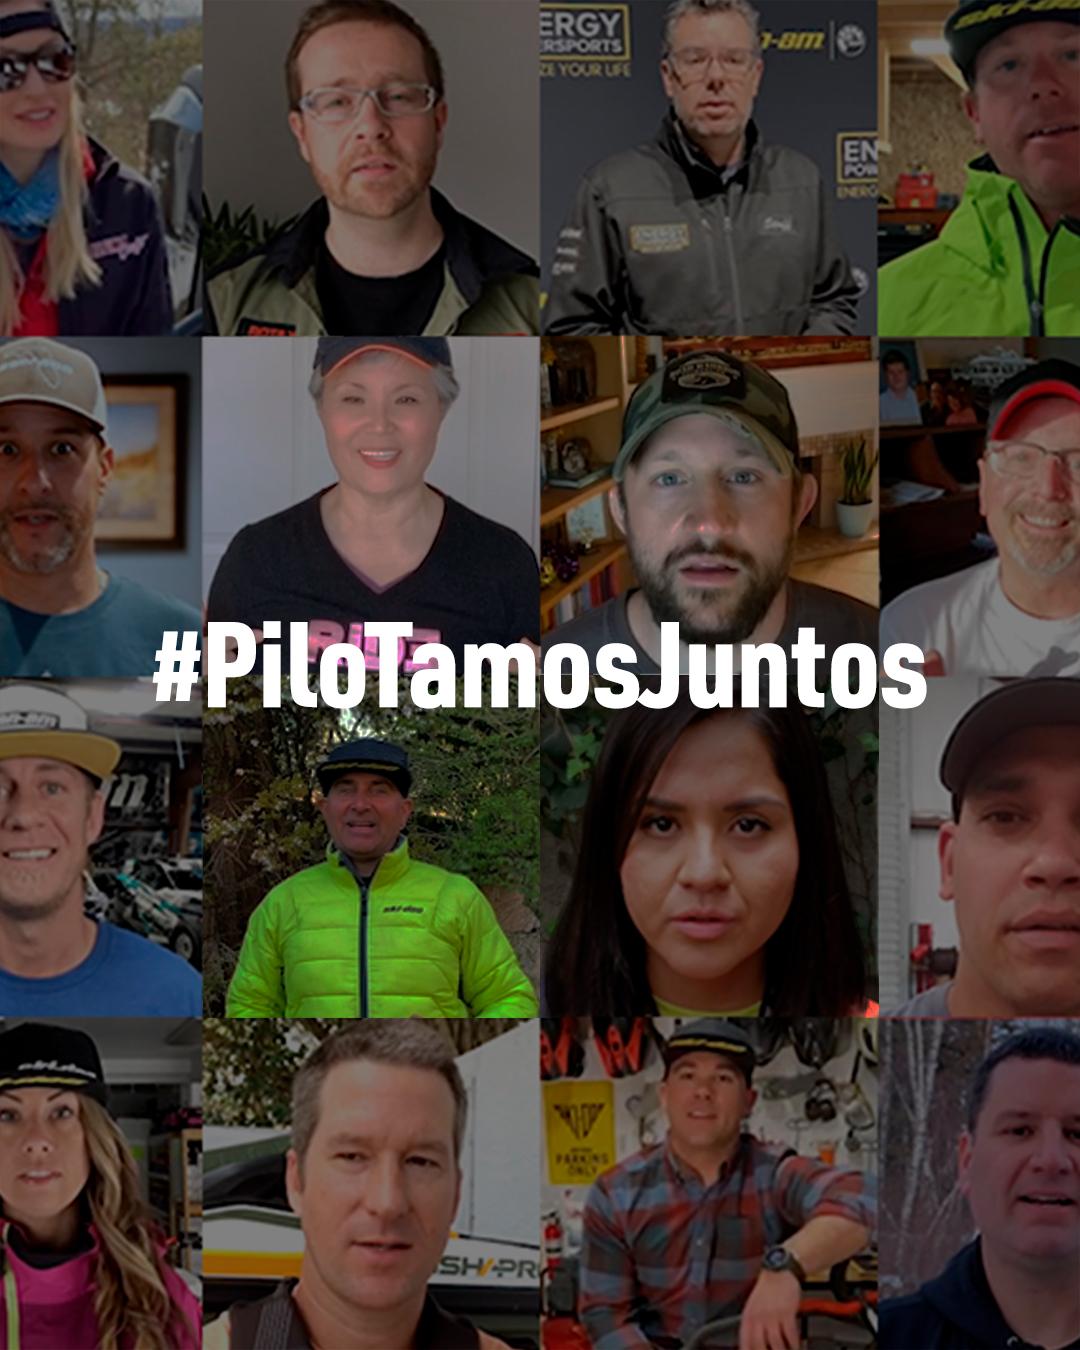 BRP - PILOTAMOS JUNTOS